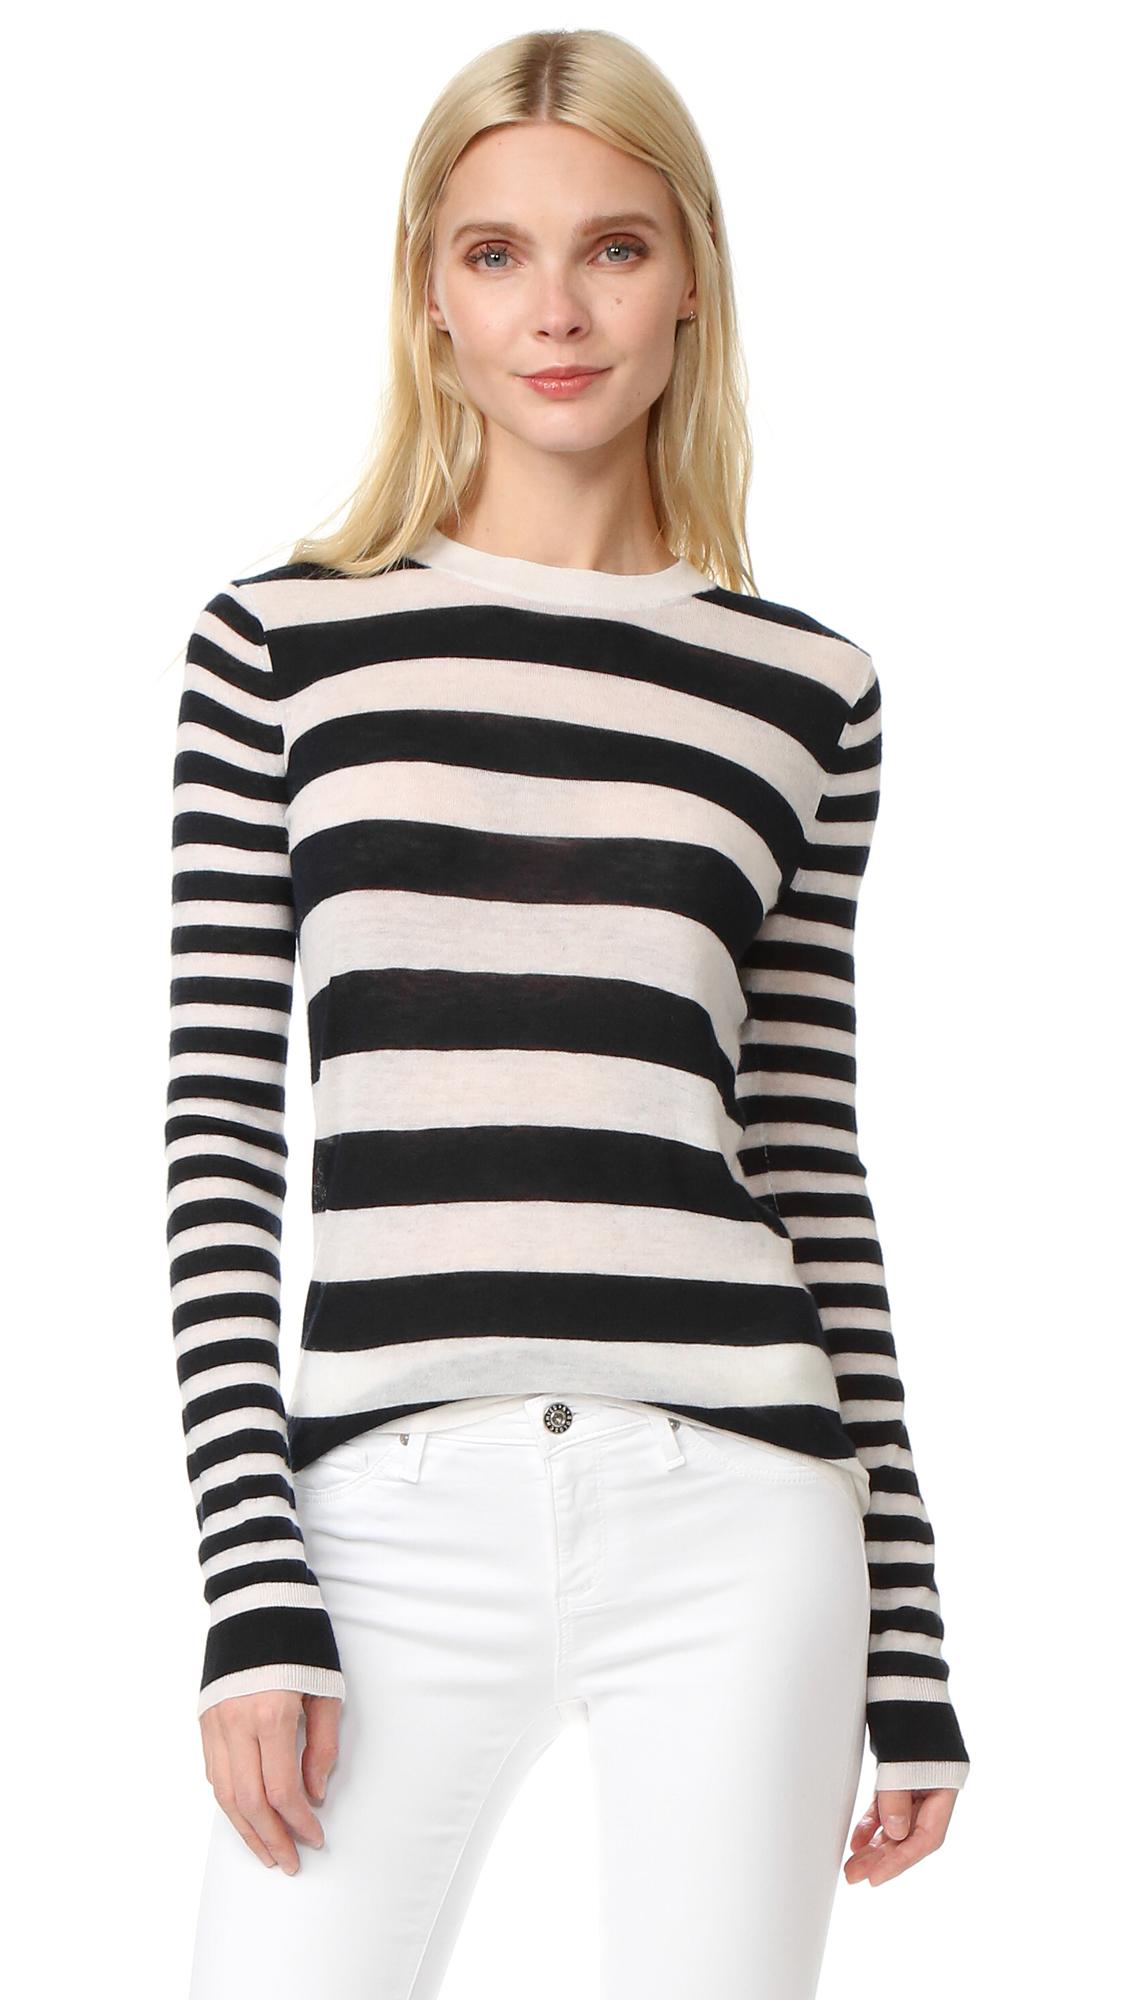 Joseph Stripe Round Neck Cashmere Sweater - Ecru/Navy